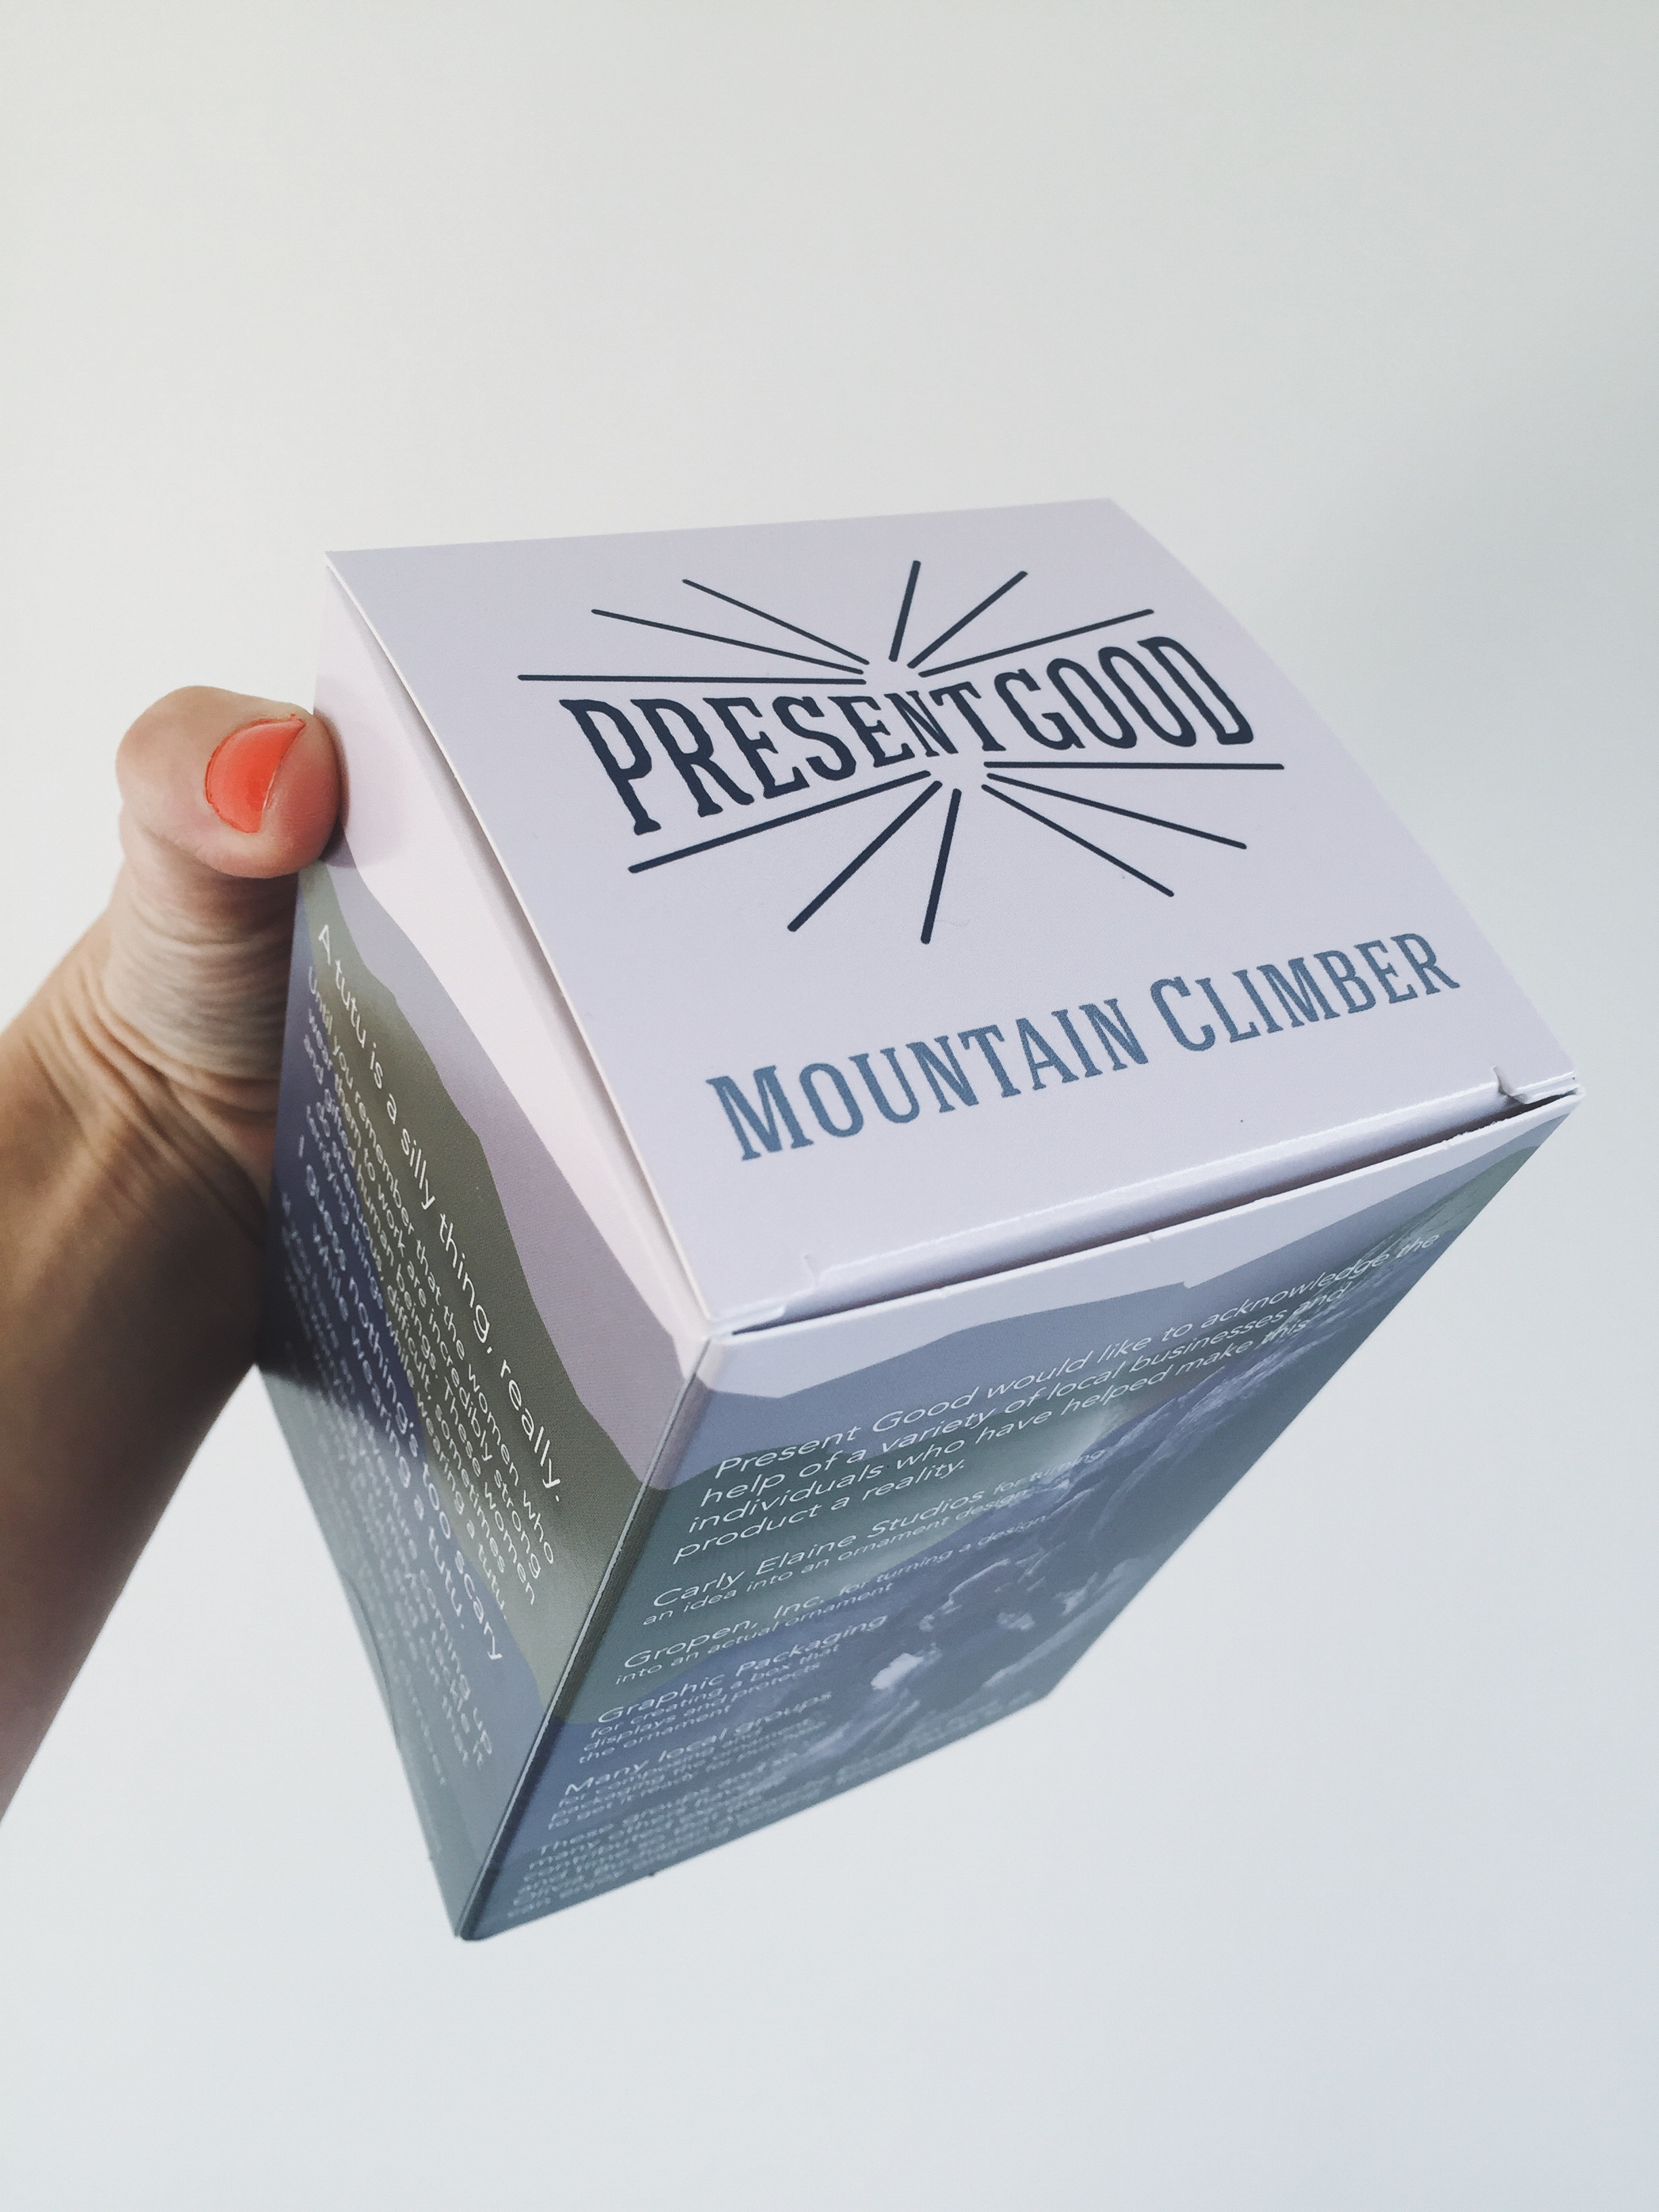 CE Studios: Branding, logo design, packaging design